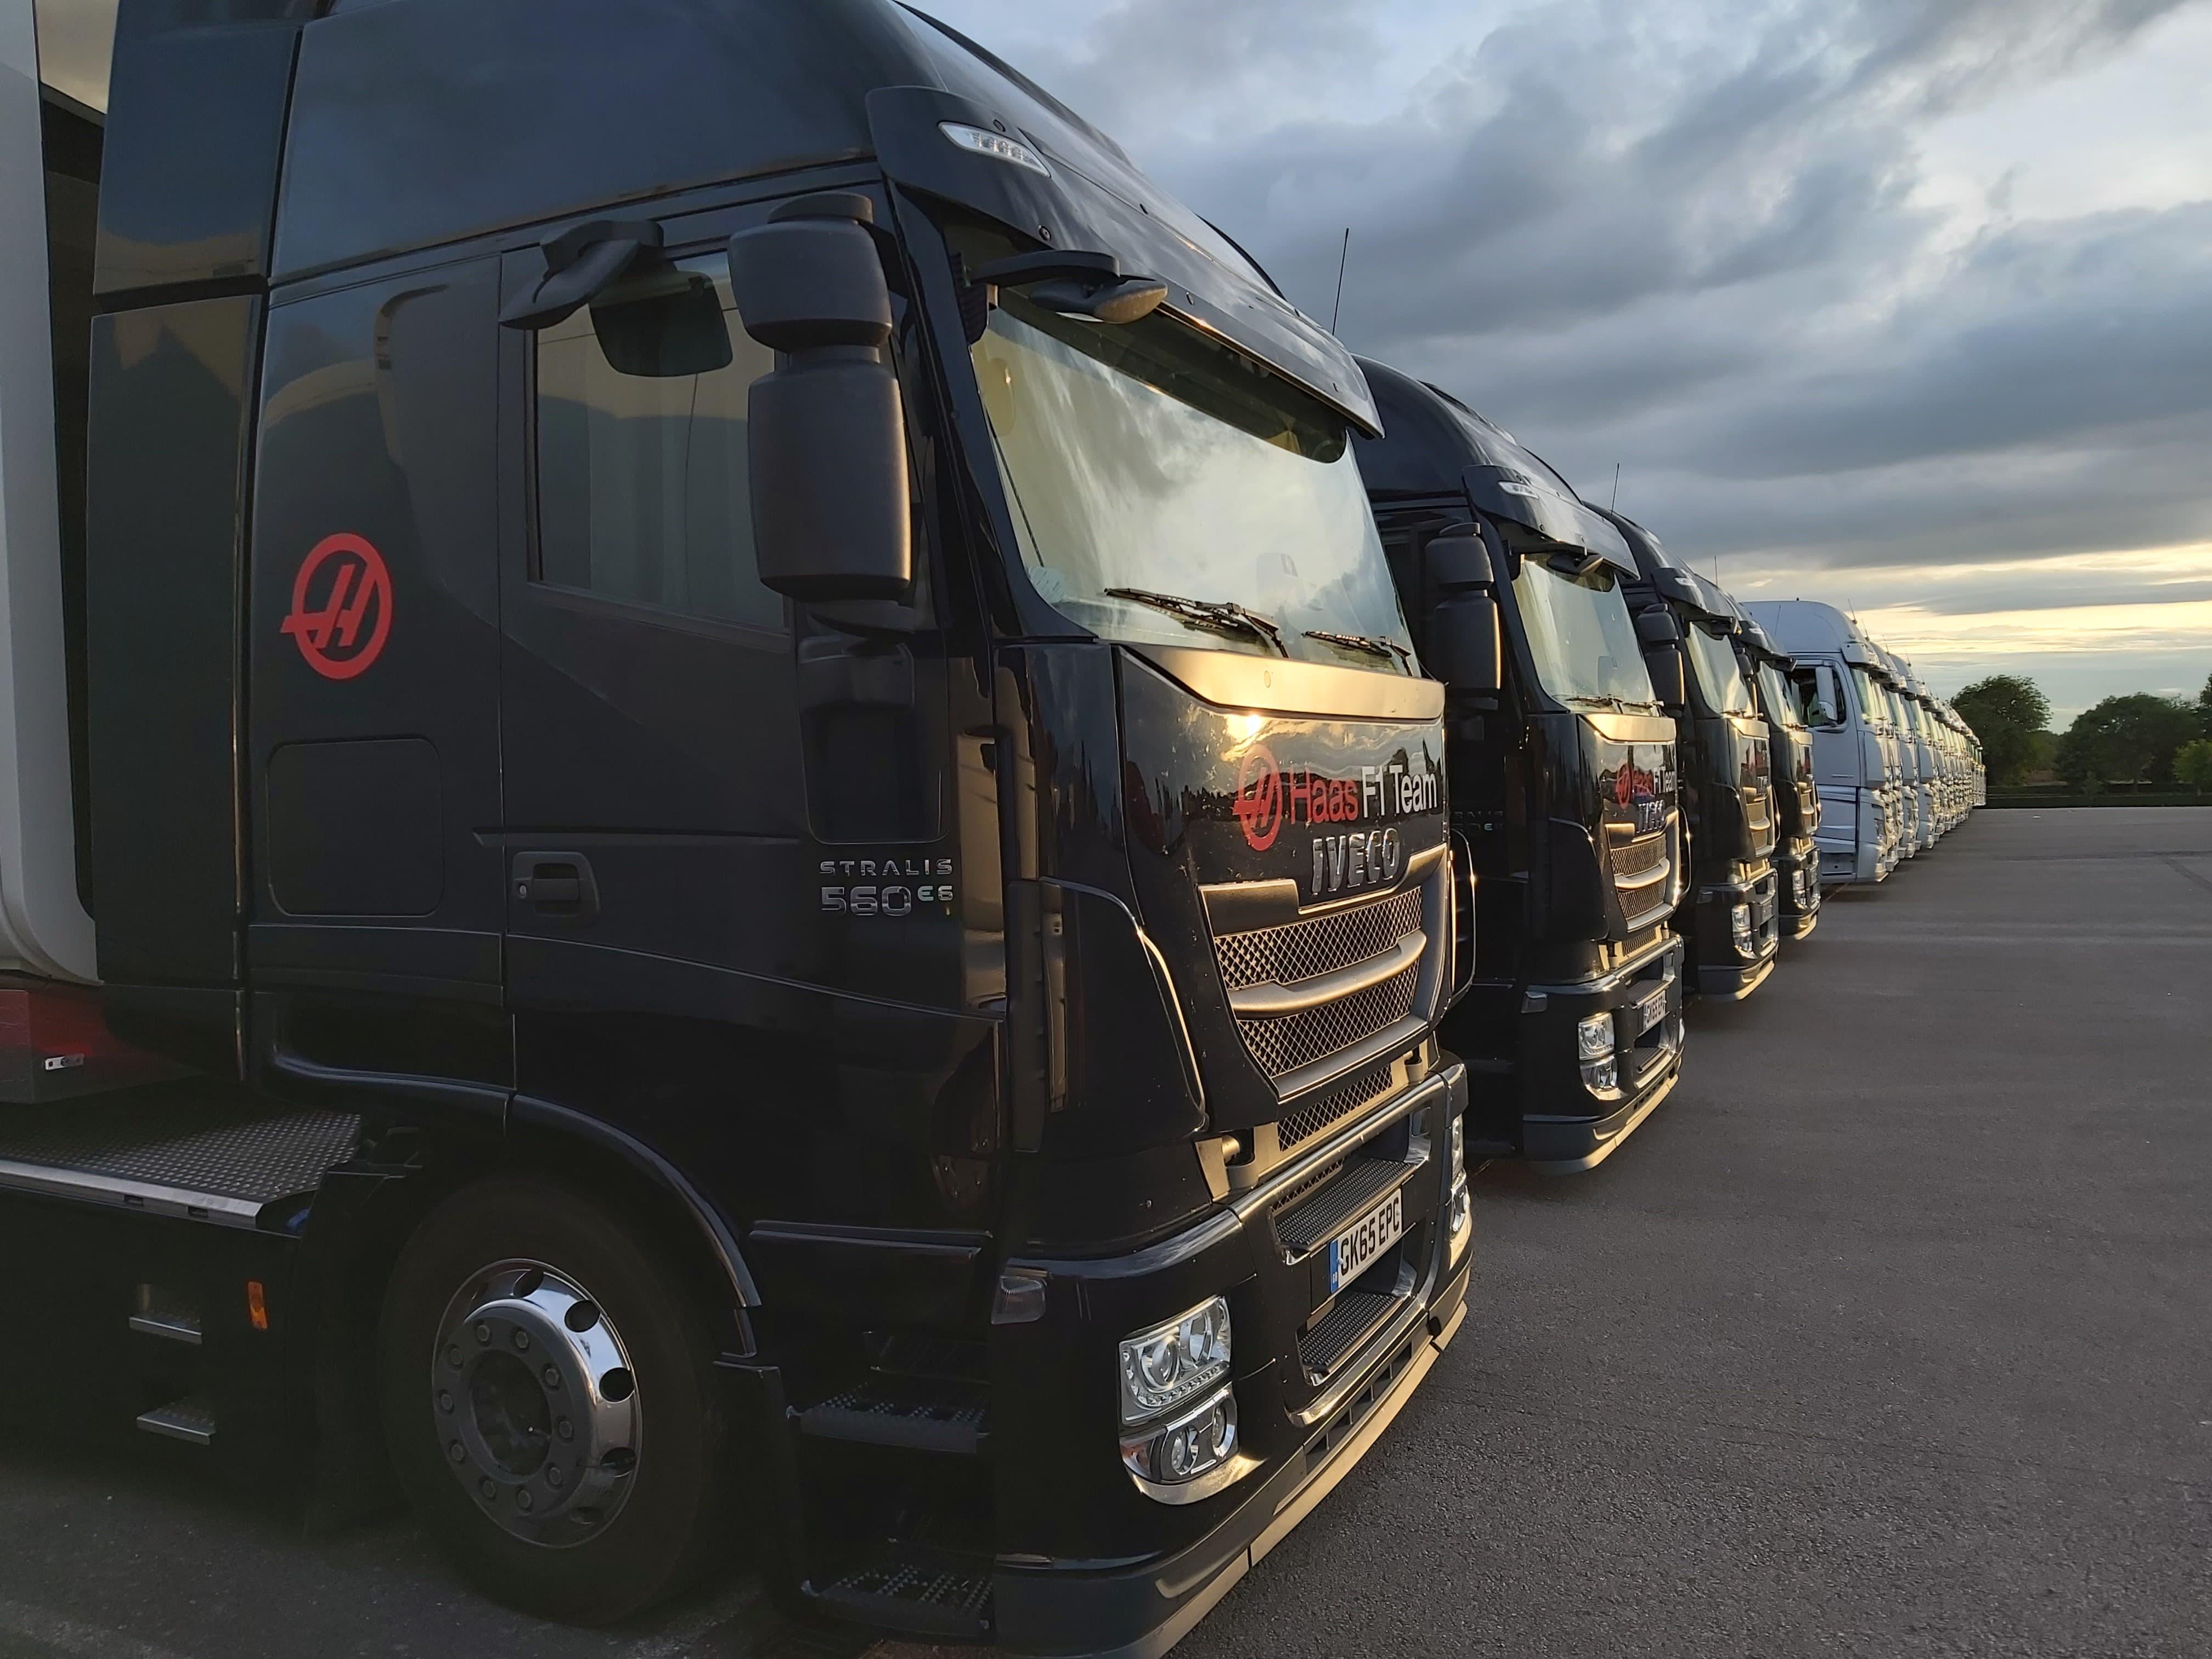 Egy F1-es kamionsofőr mindennapjai